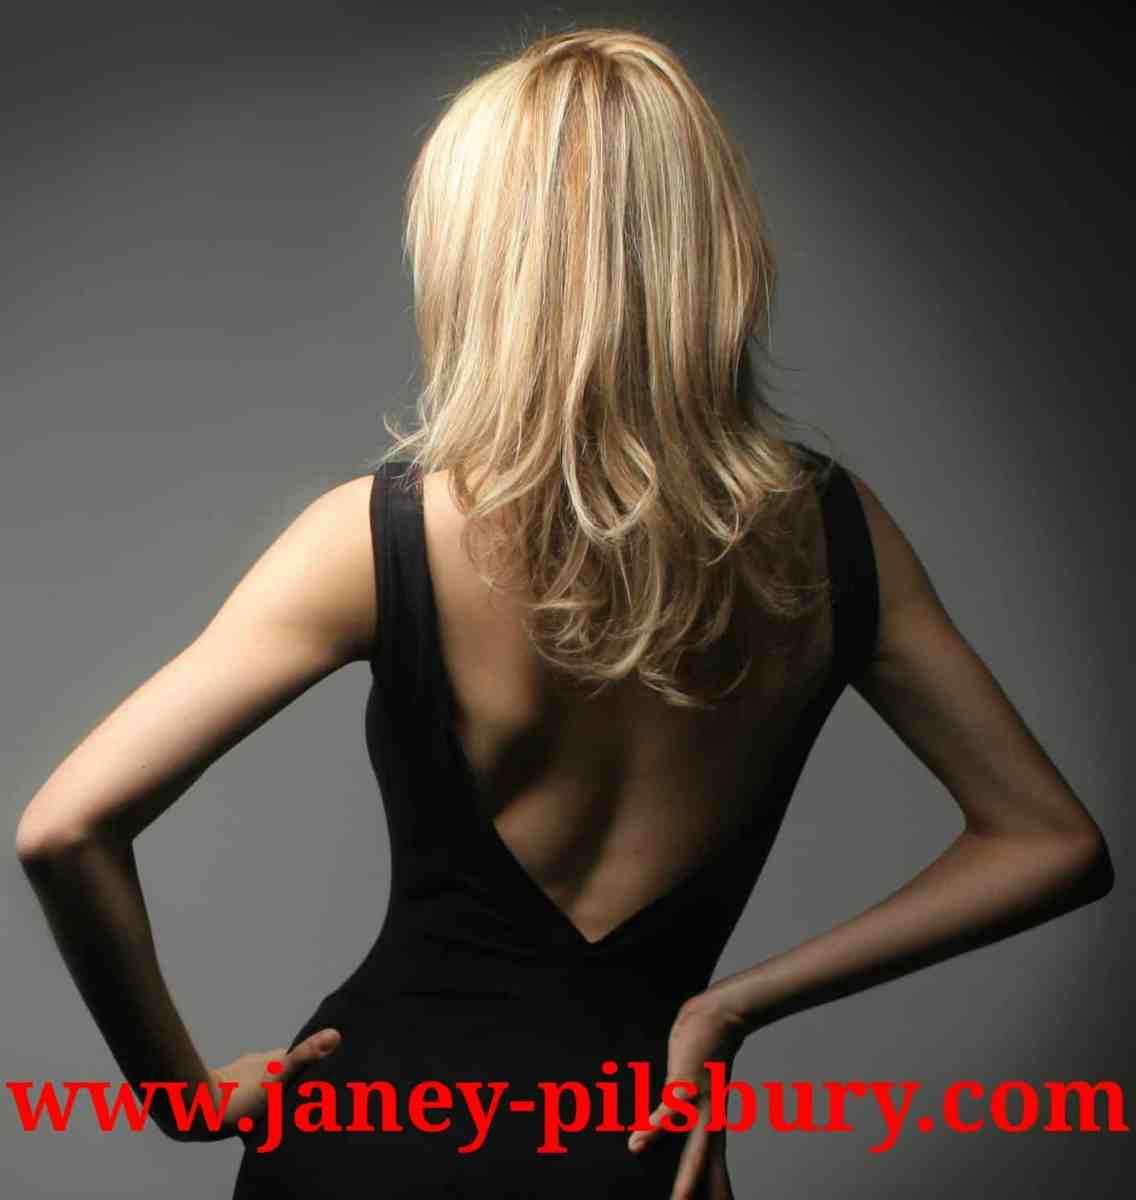 Janey Pilsbury